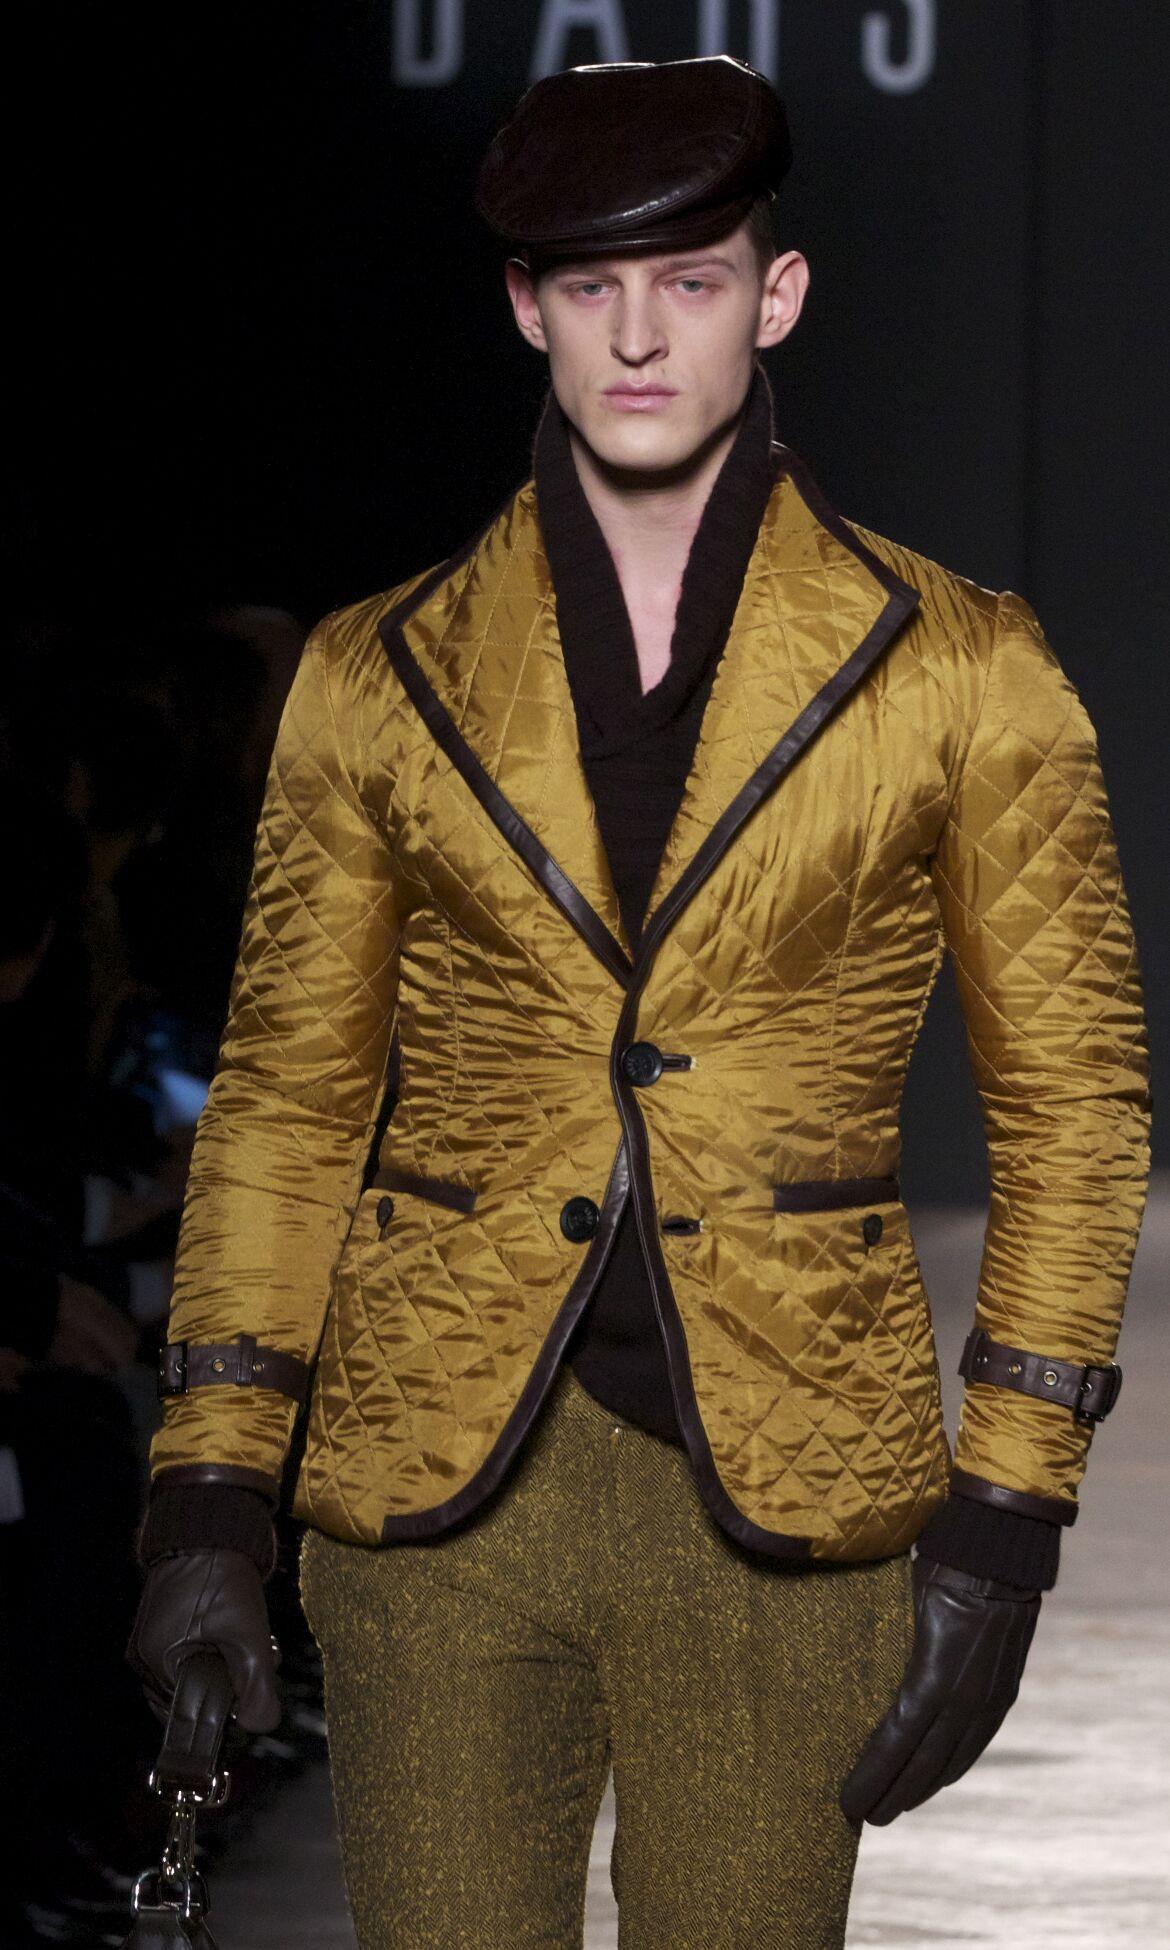 Catwalk Daks Fashion Show Winter 2013 Menswear